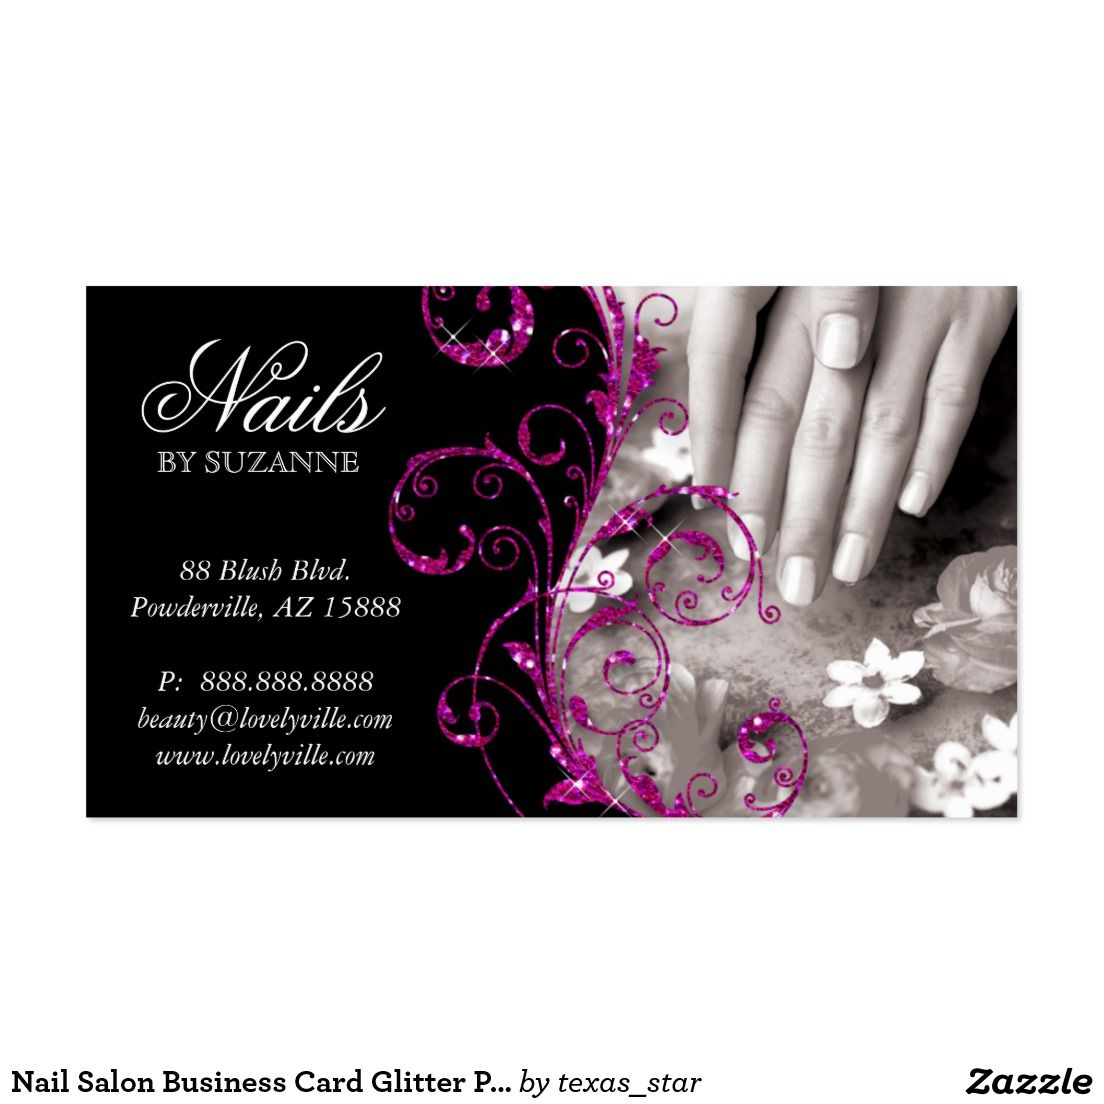 Nail Salon Business Card Glitter Pink | Nail salons and Salons